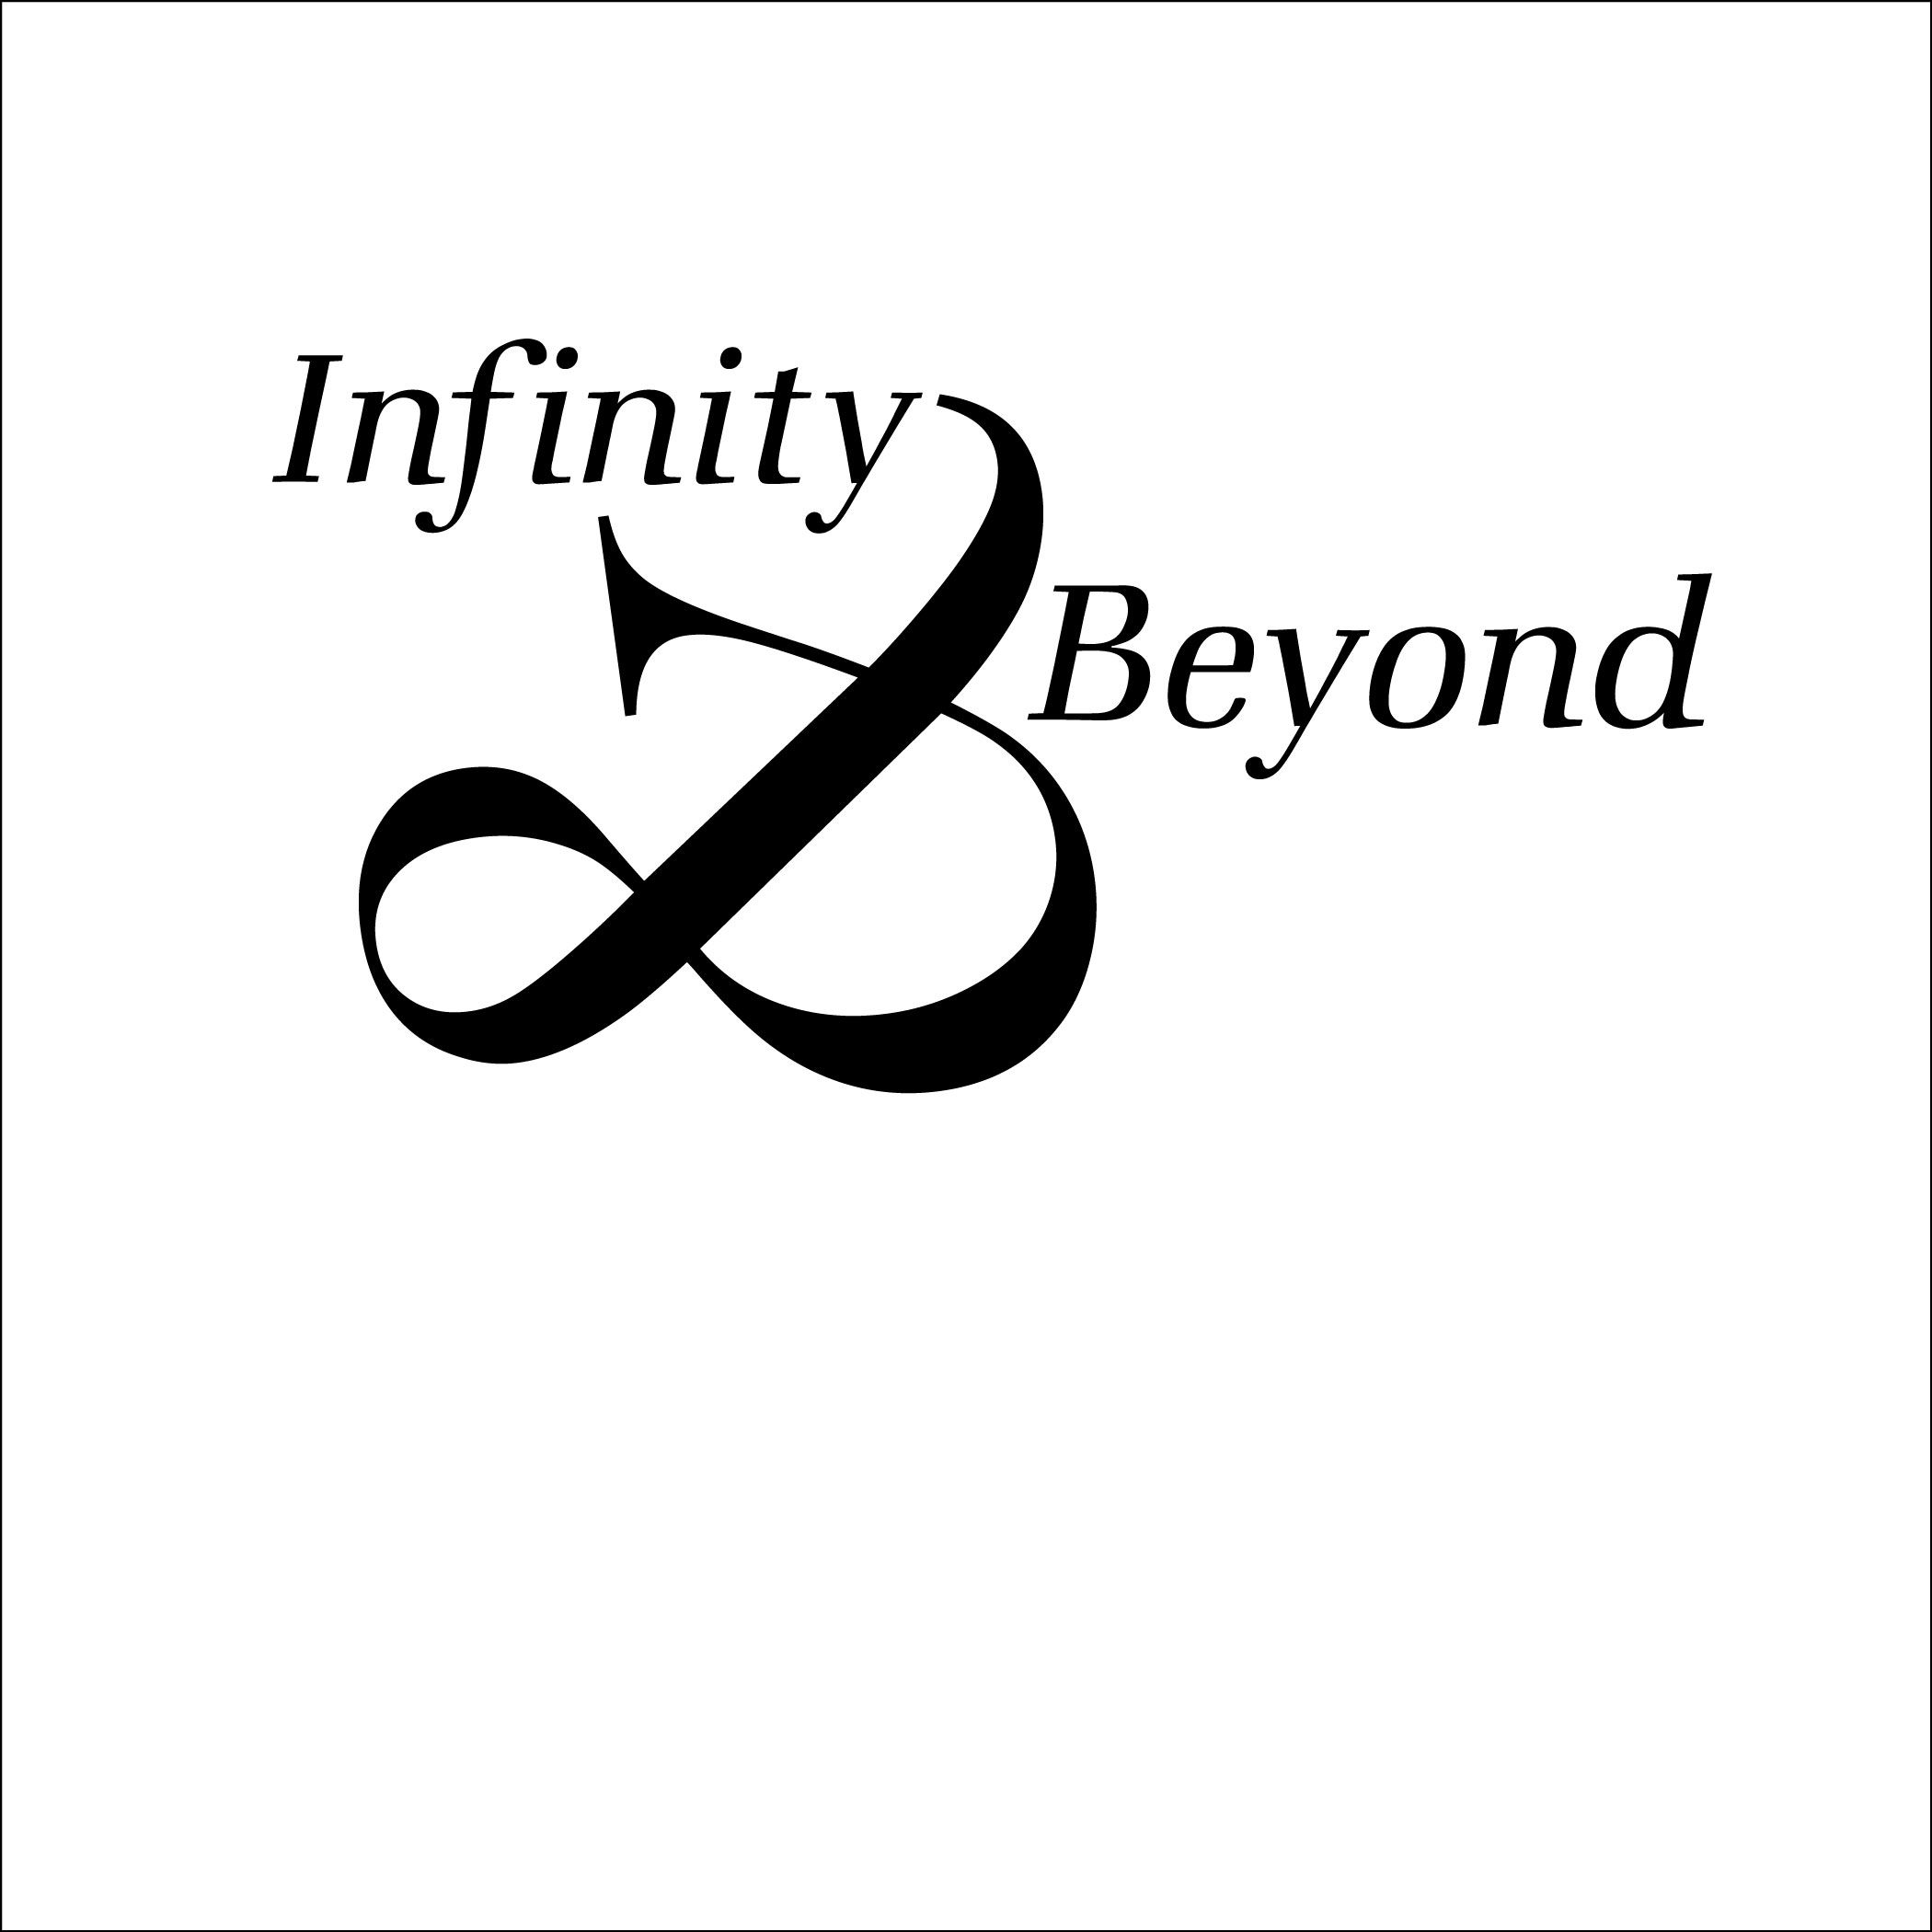 Infinity and Beyond by Jillian Lees using Illustrator CC